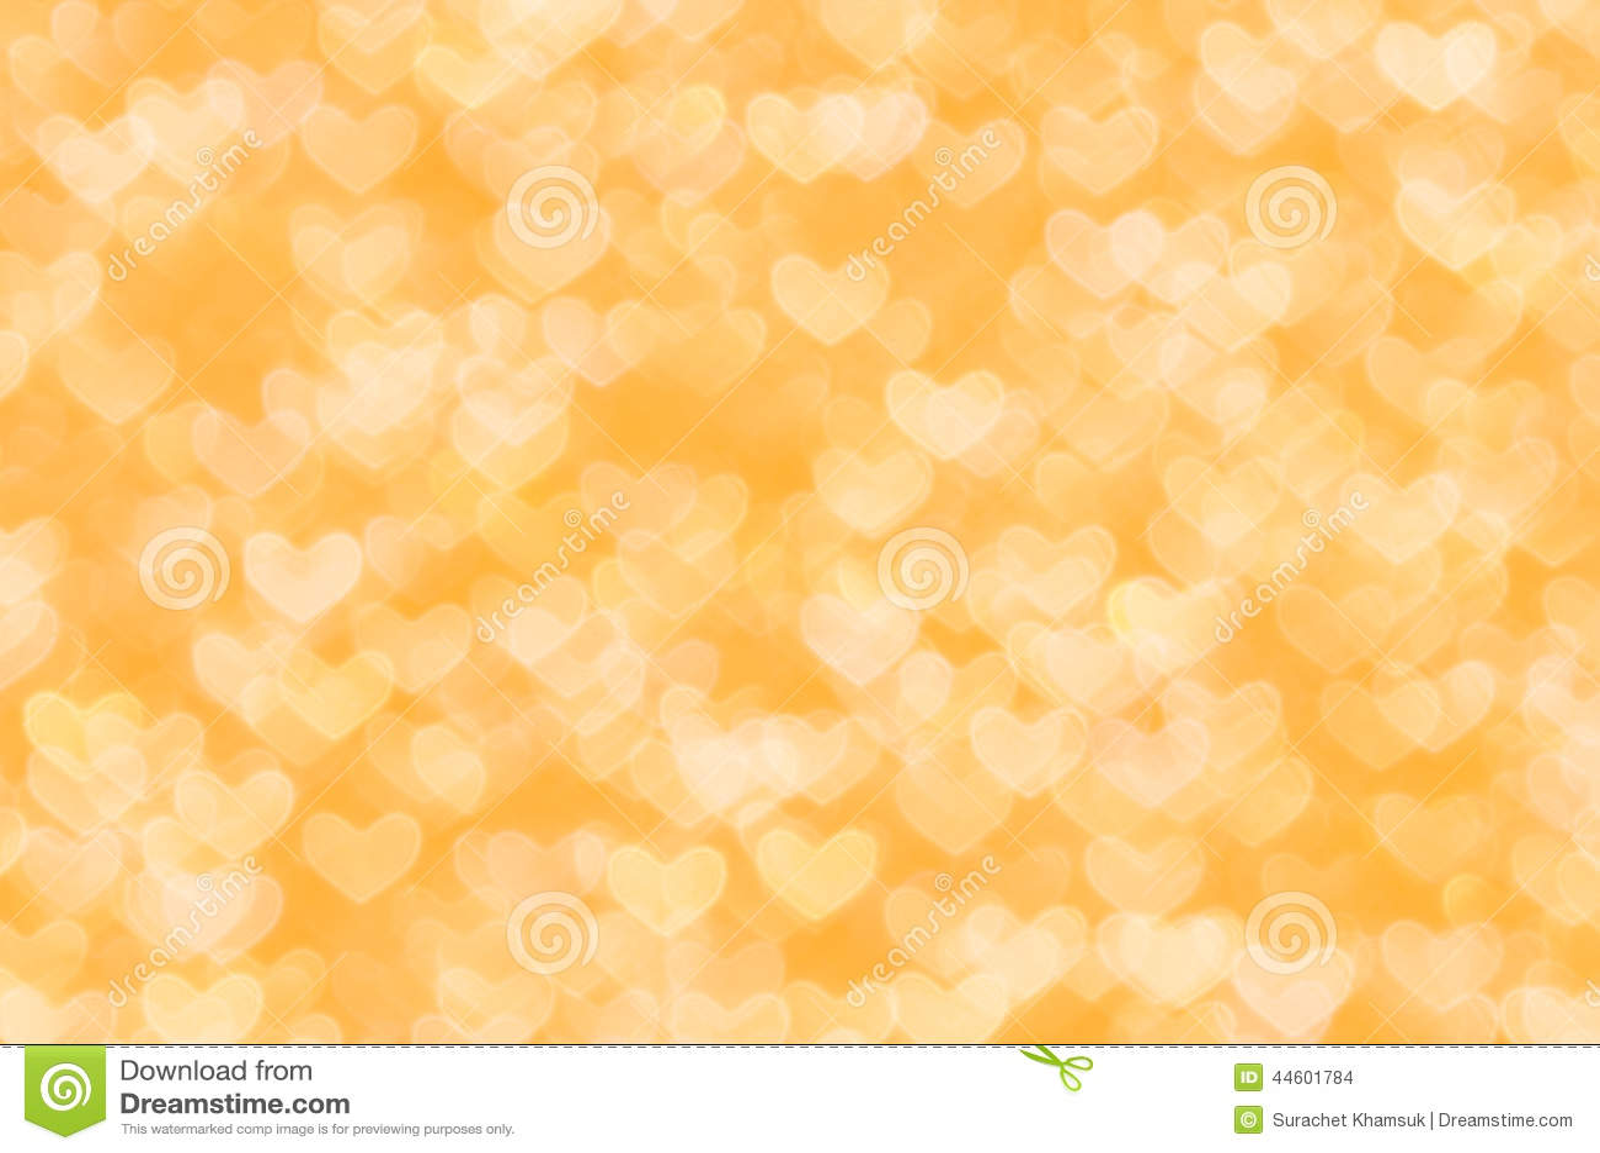 Defocused Abstract Orange Hearts Light Background Stock Photo ... for Background Pattern Light Orange  285eri